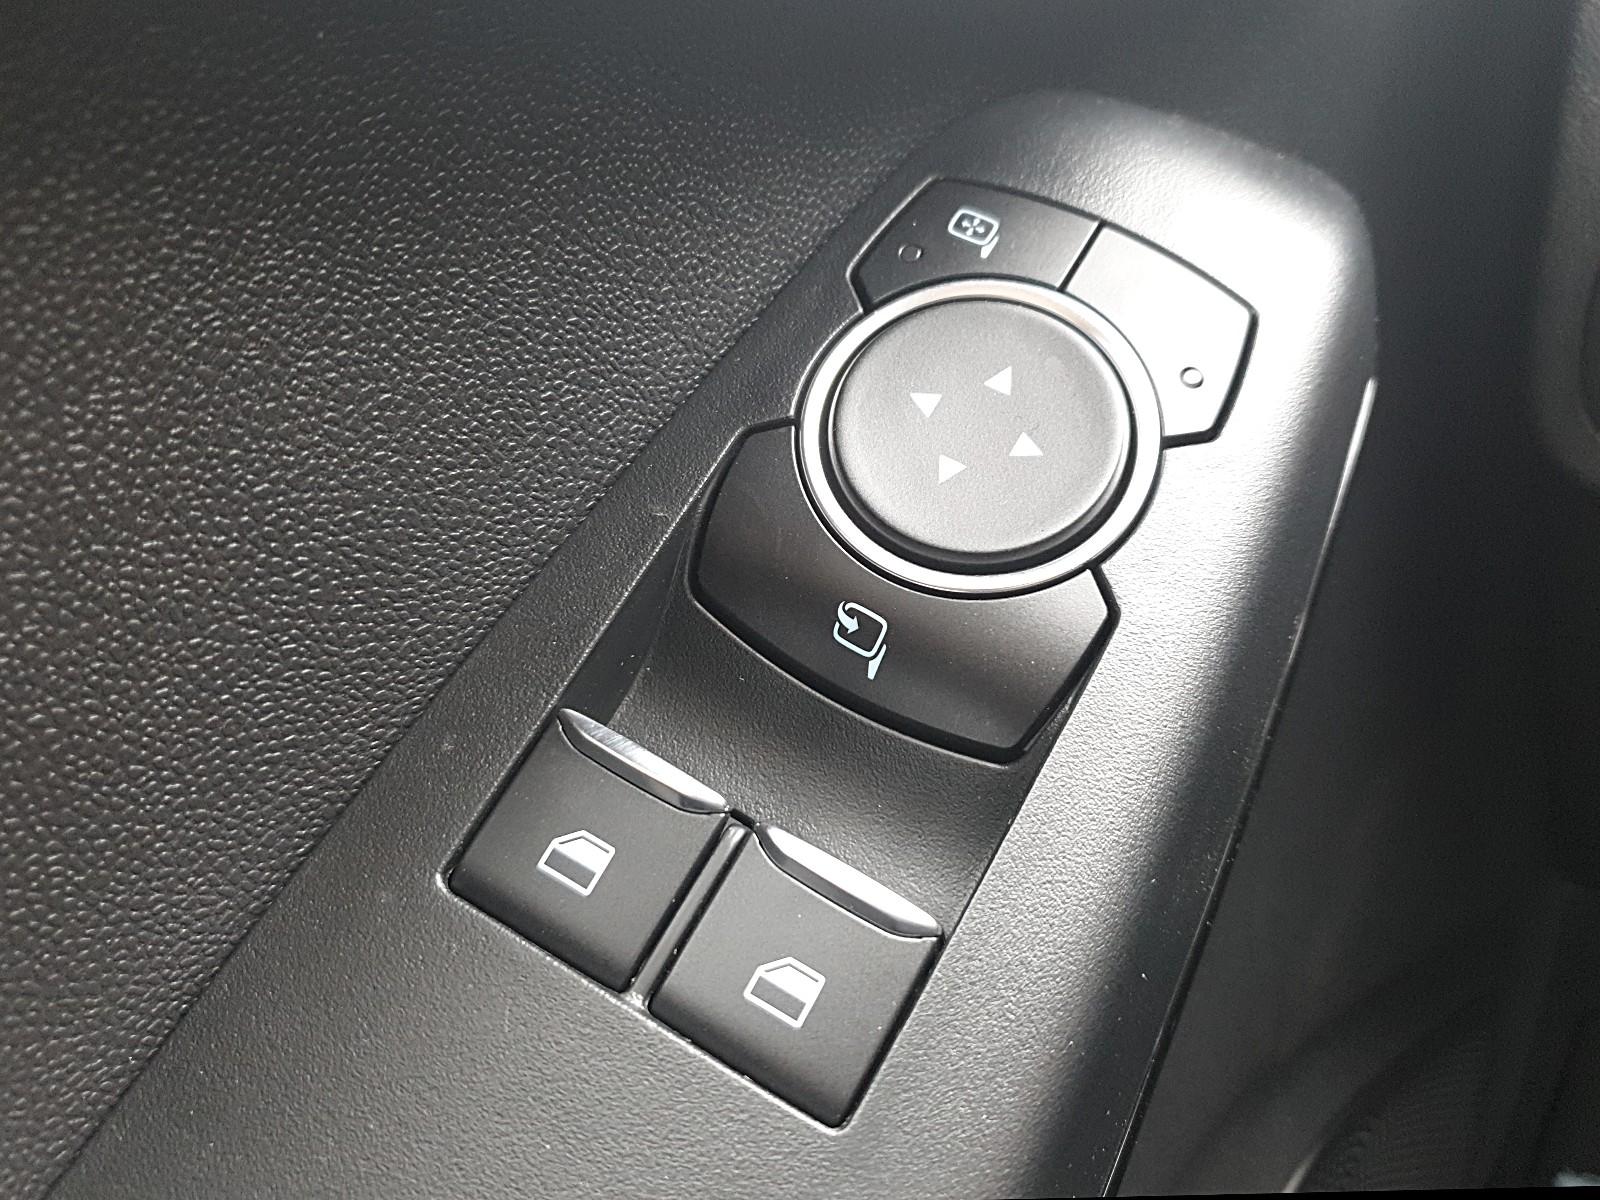 FORD FIESTA 1.1 70PS Trend 5-Türig Klima Navi Bluetooth PDC DAB+ Touch-Bilds Viscaal Fahrzeuggrosshandel GmbH, D-49847 Itterbeck